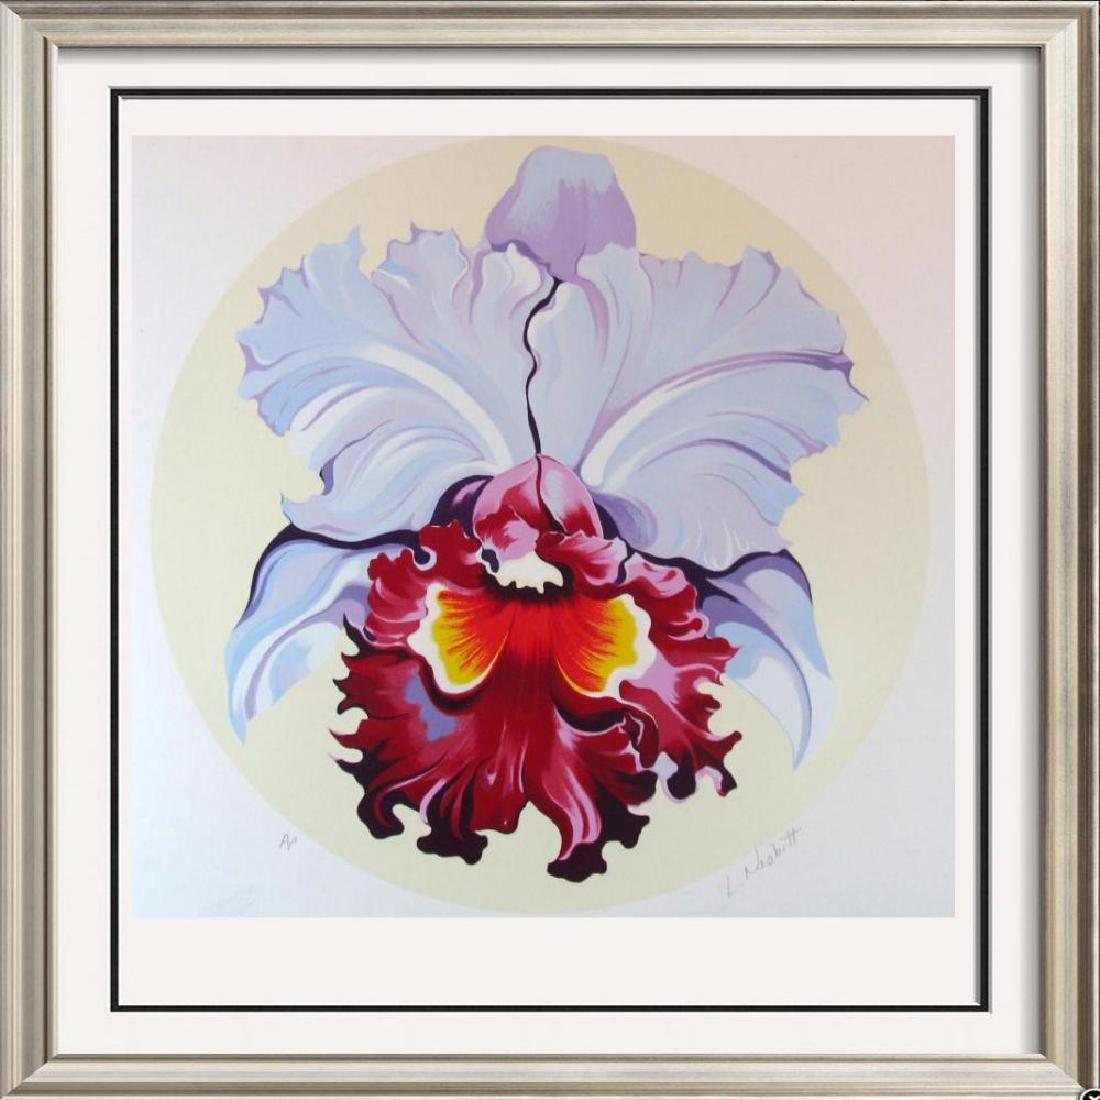 Lowell Nesbitt Orchid Ltd Ed Hand Signed Colorful Art